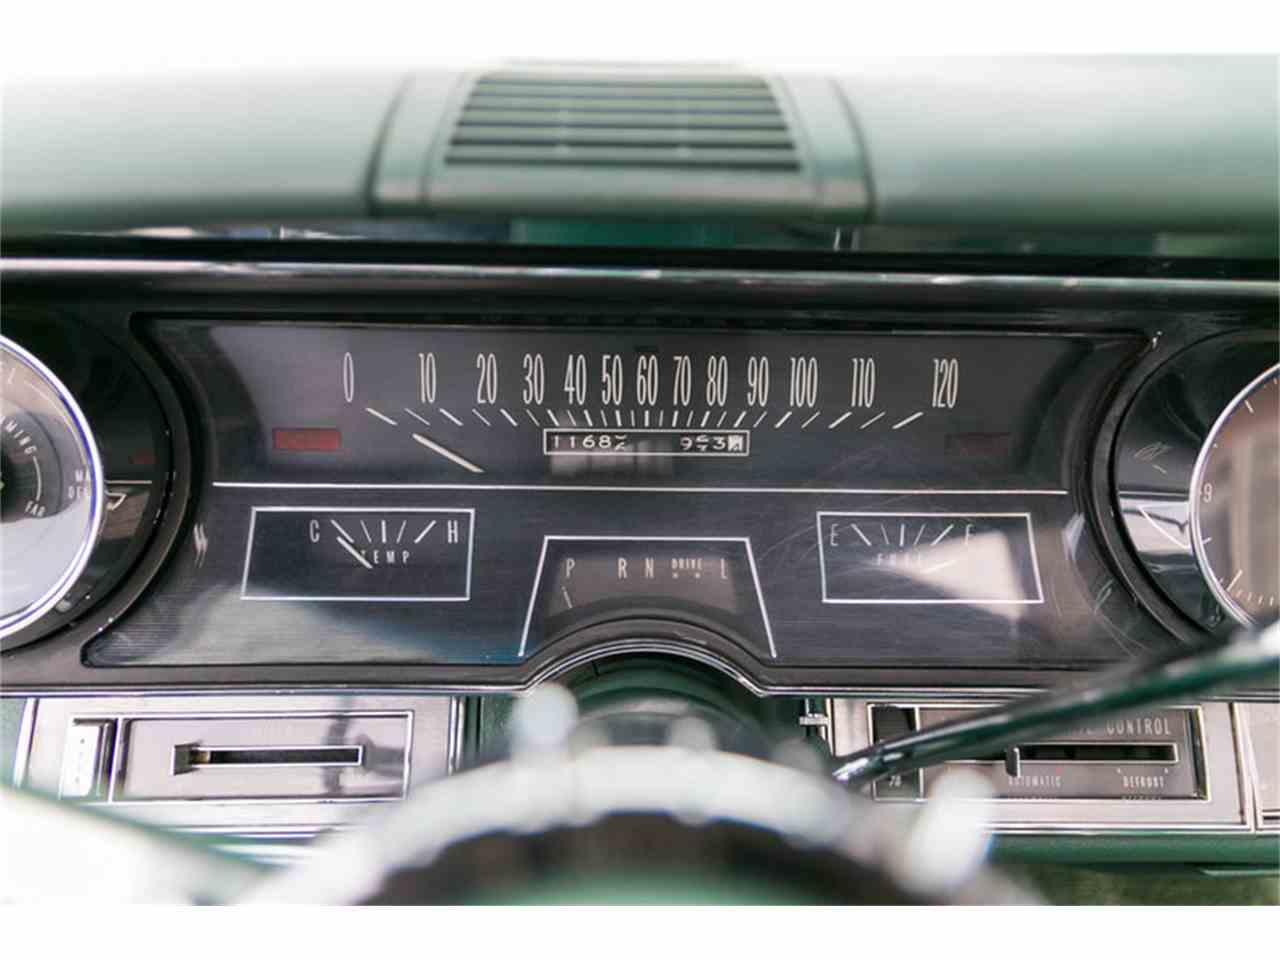 Cadillac Dealers In Missouri1966 Eldorado For Sale 1951 Series 62 Sedan 1966 Classiccars Com Cc 1039585